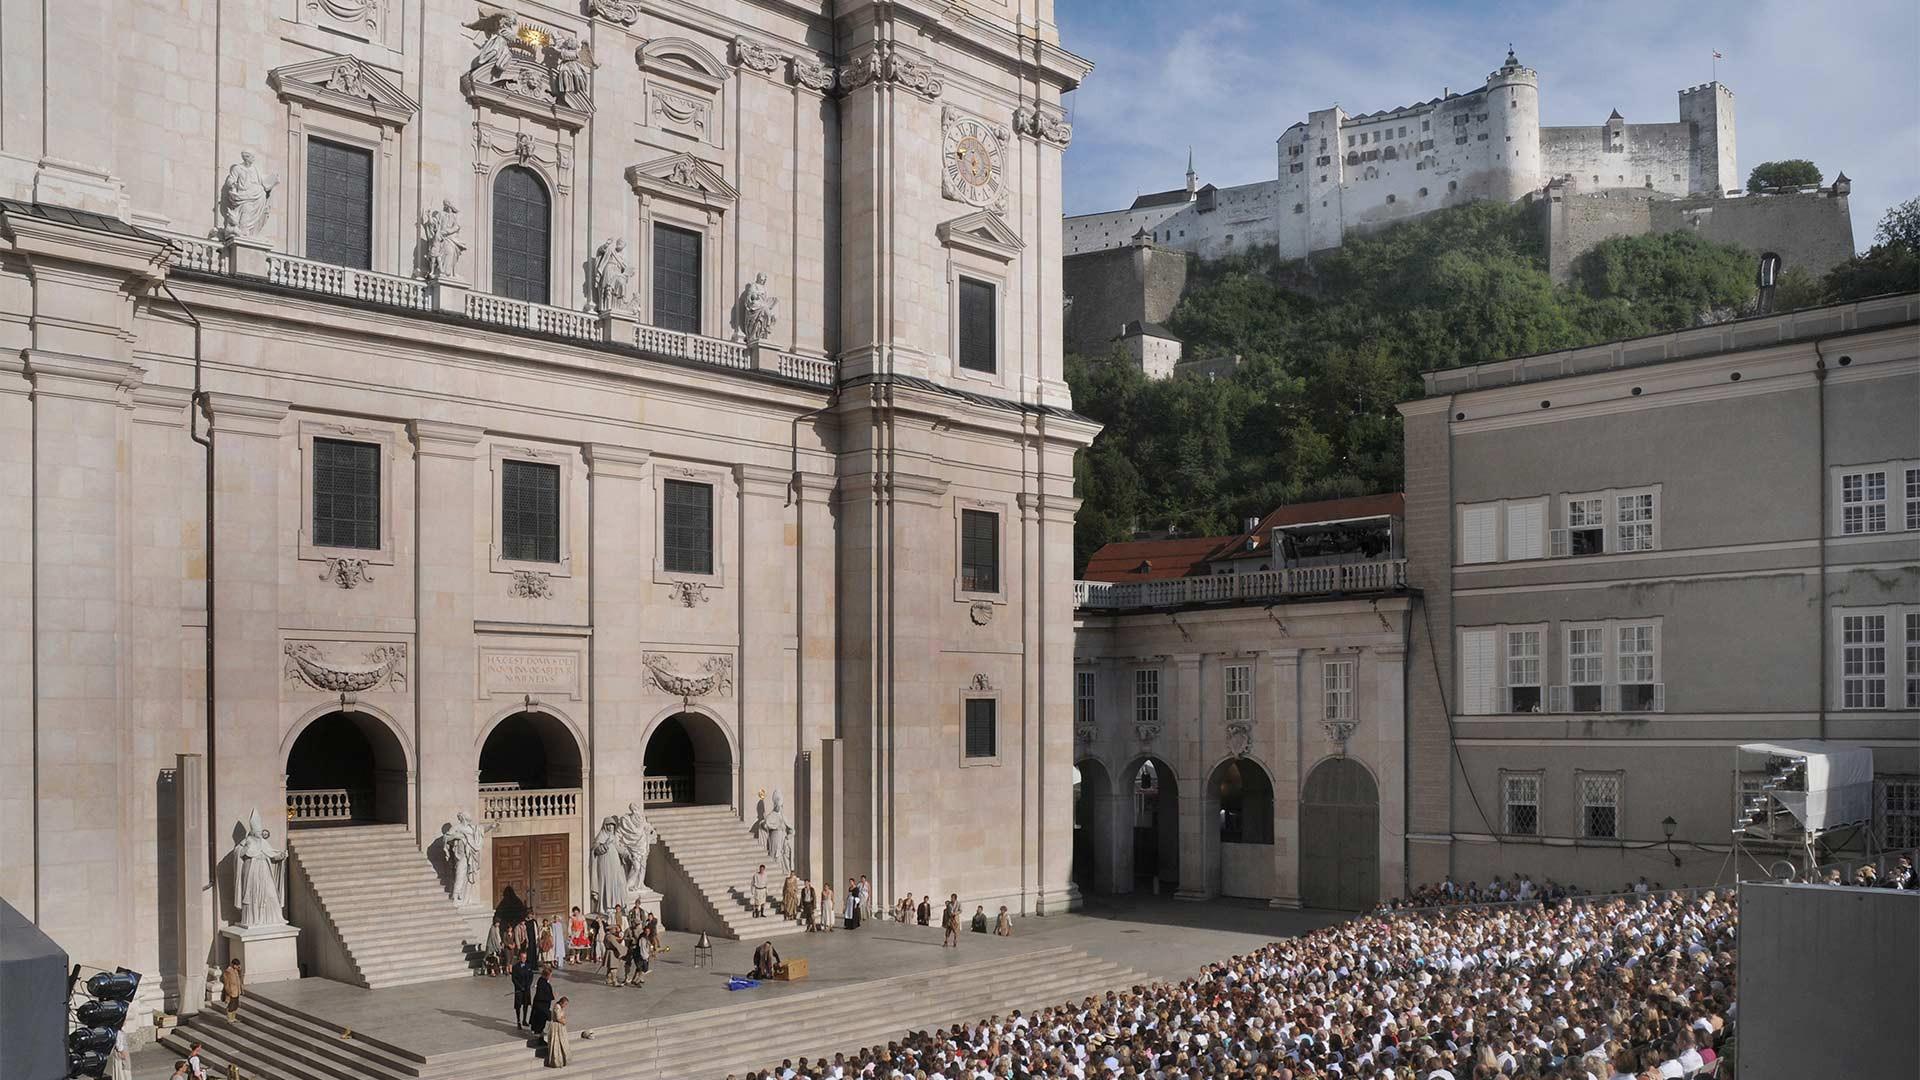 Salzburg festival, the highlight of the summer season